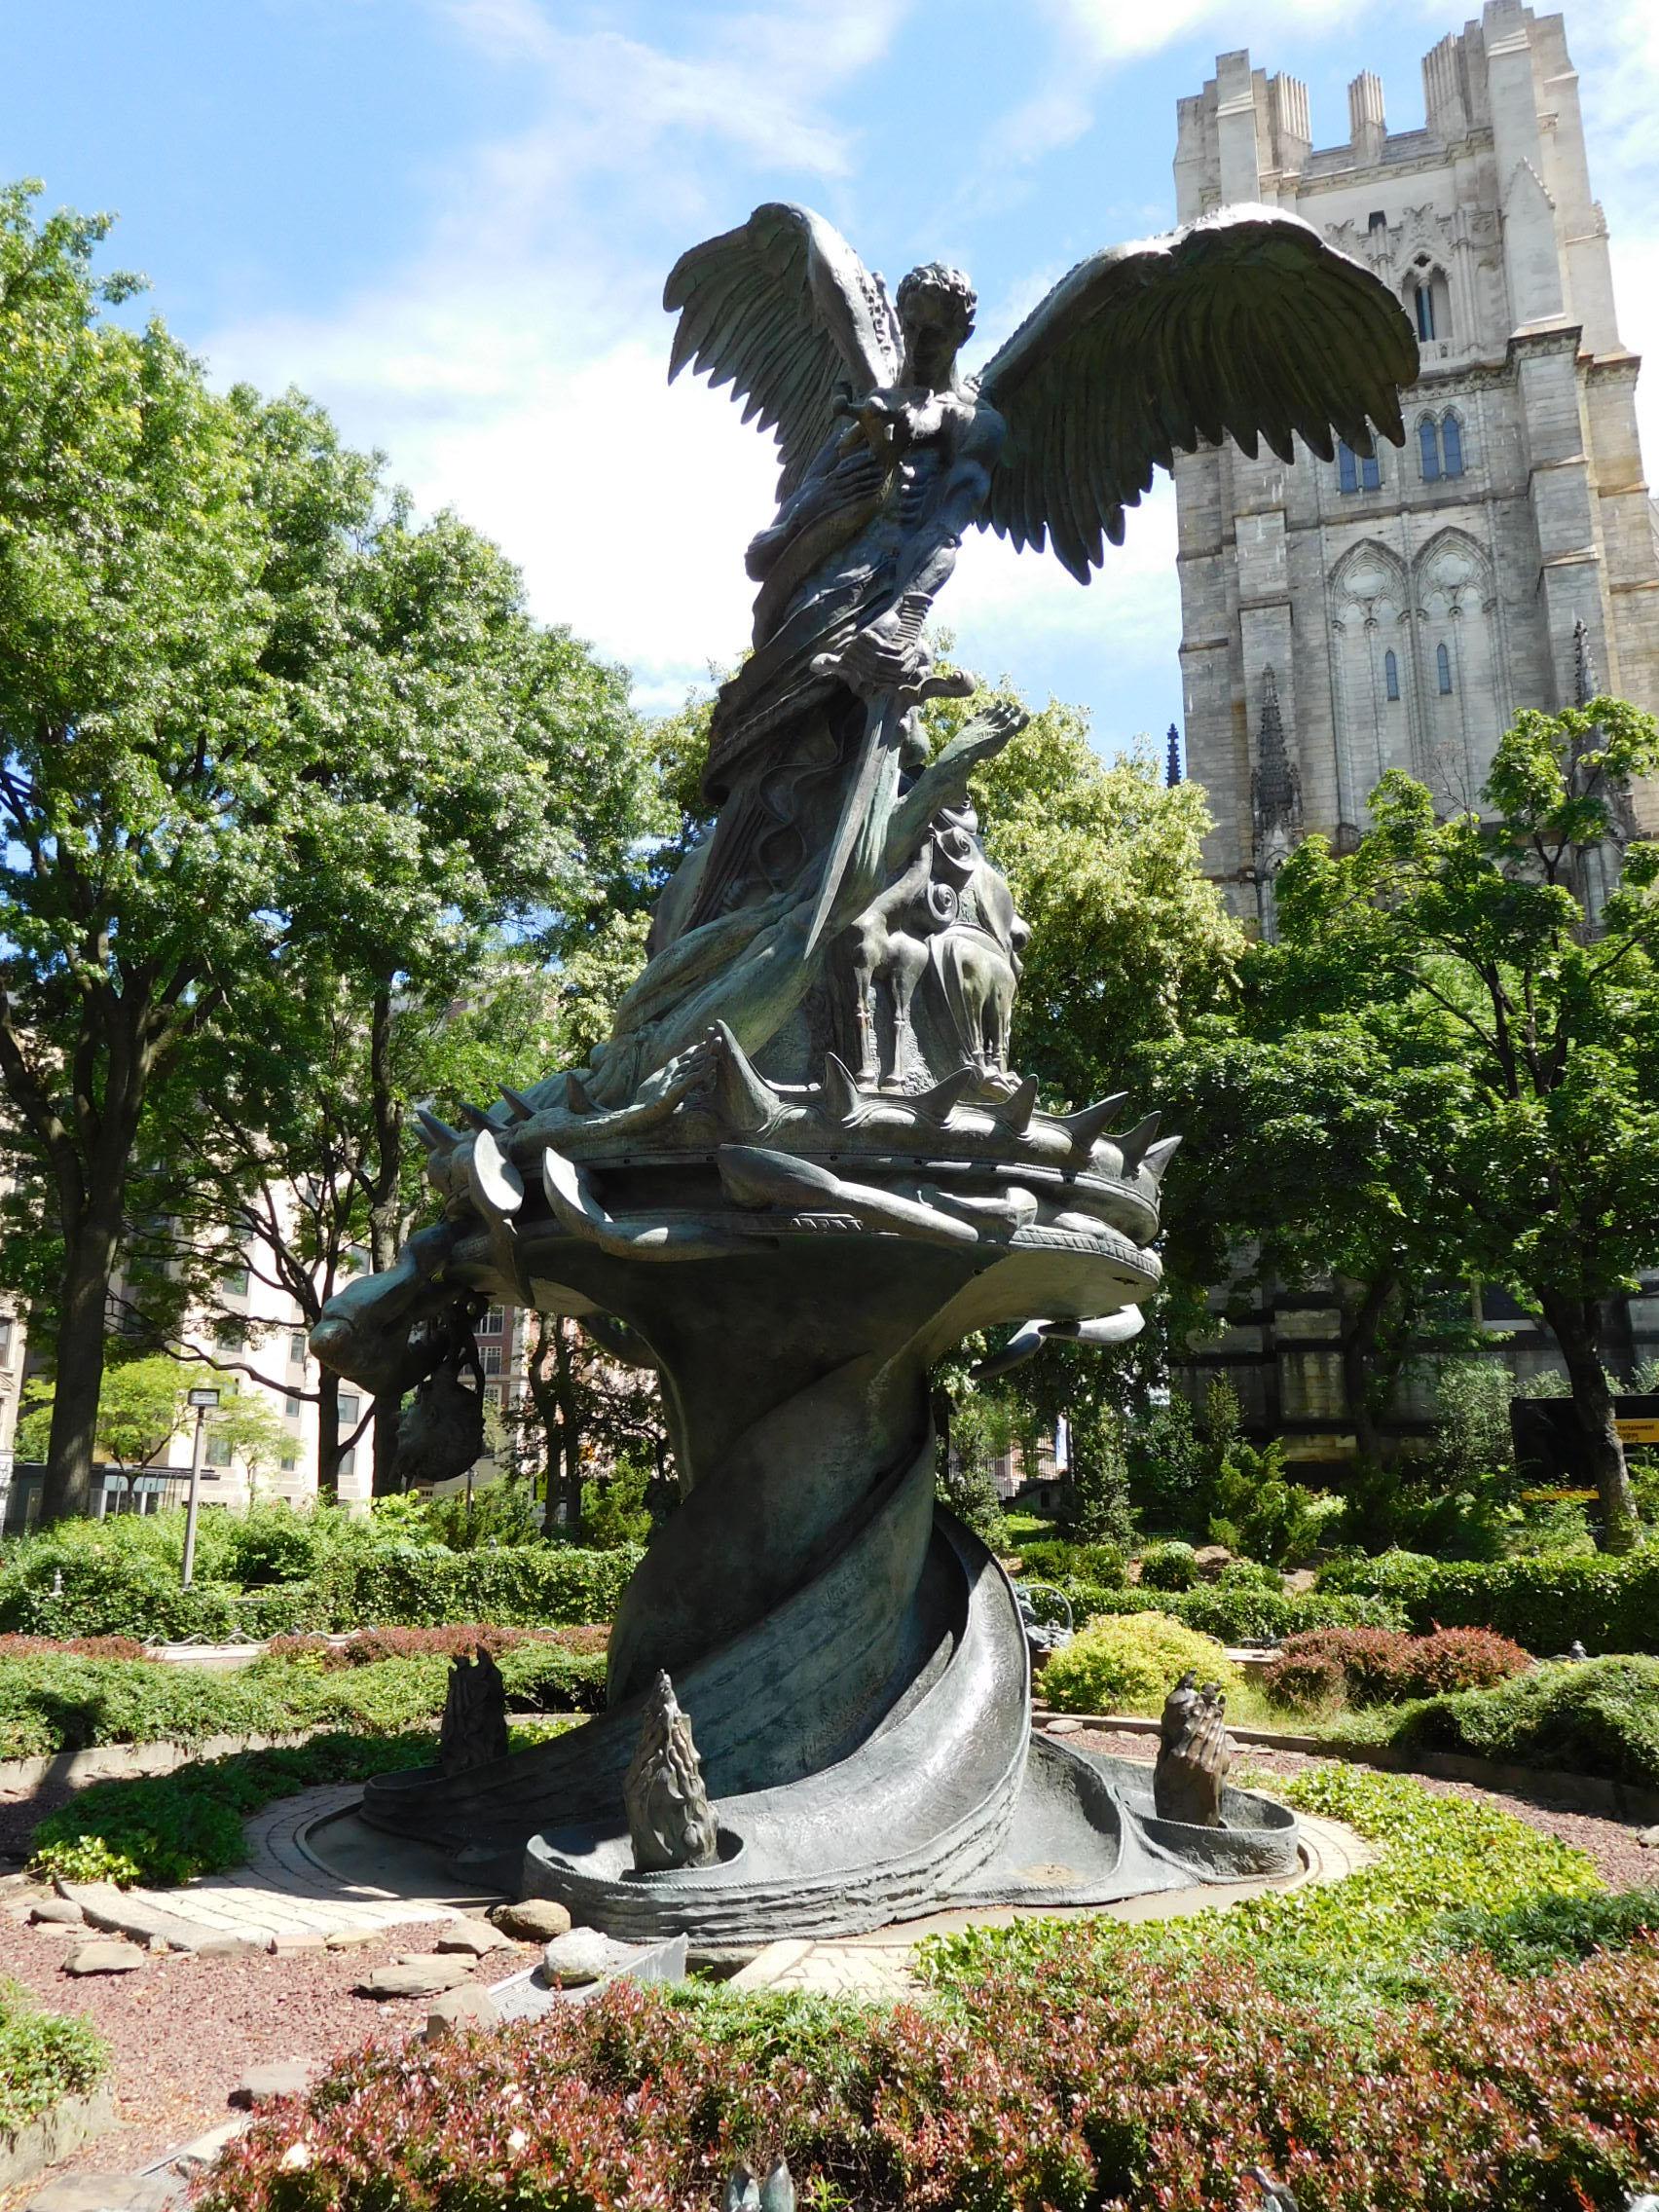 ^ The Peace Fountain